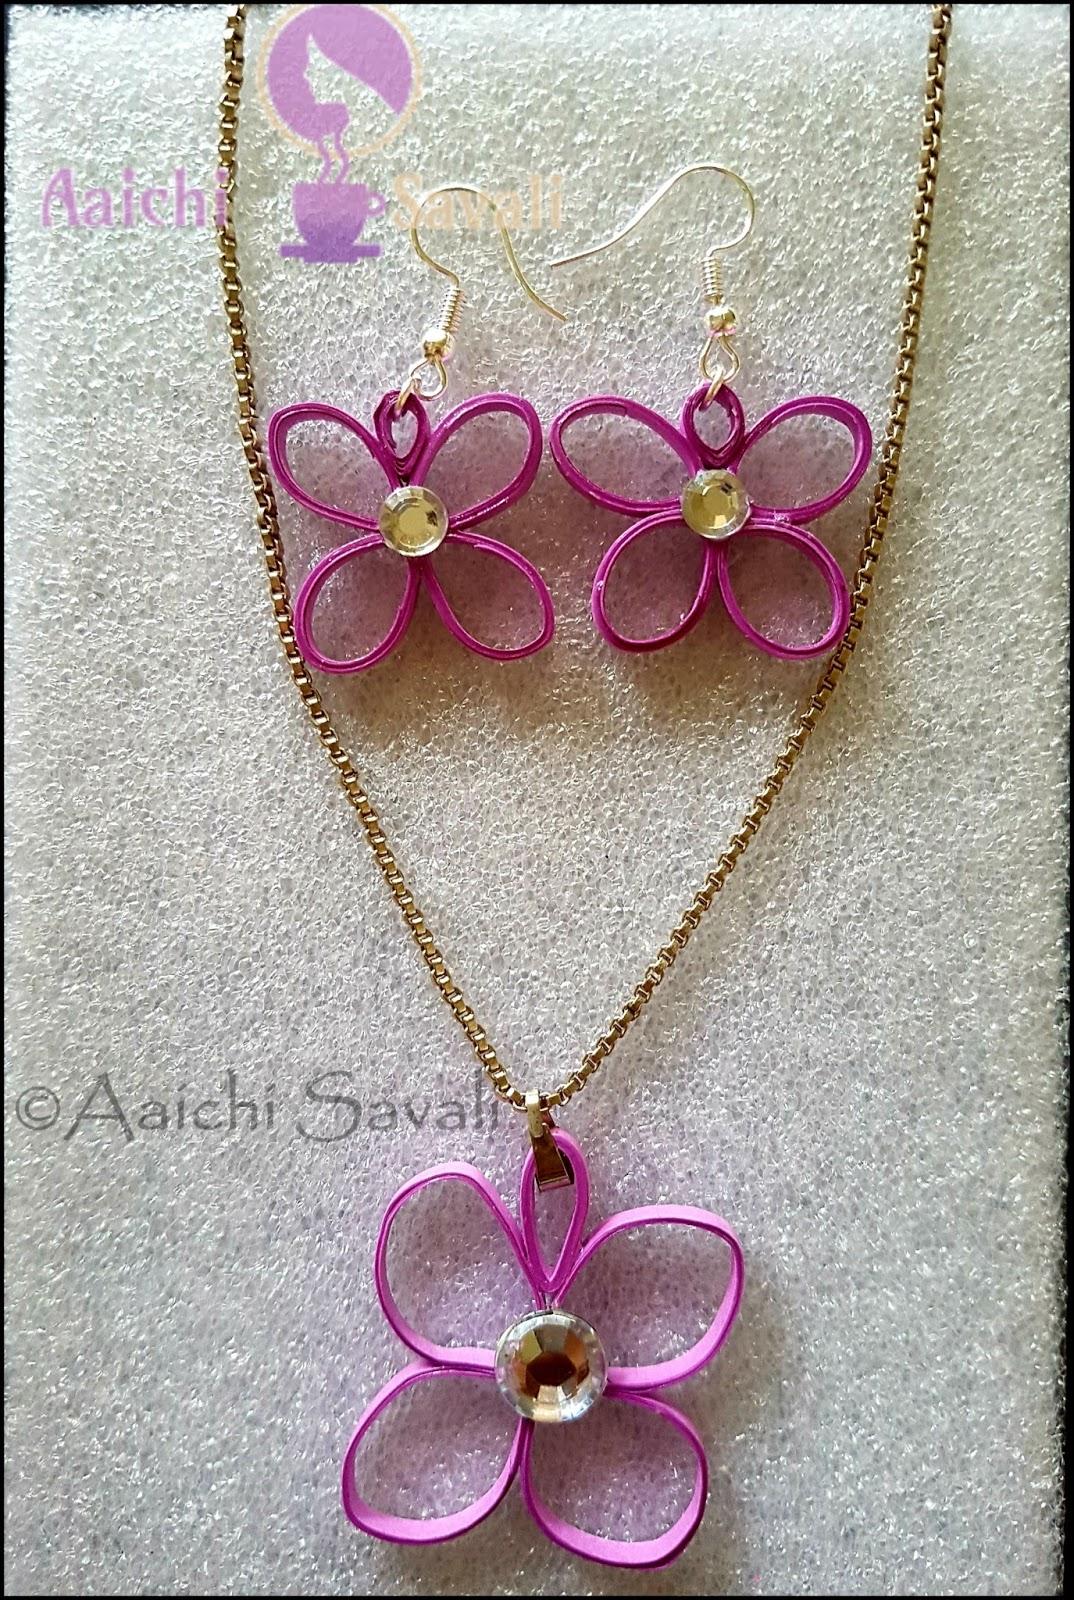 How to make paper Hawaii lei? - DIY | Hawaii crafts, Flower ... | 1600x1074